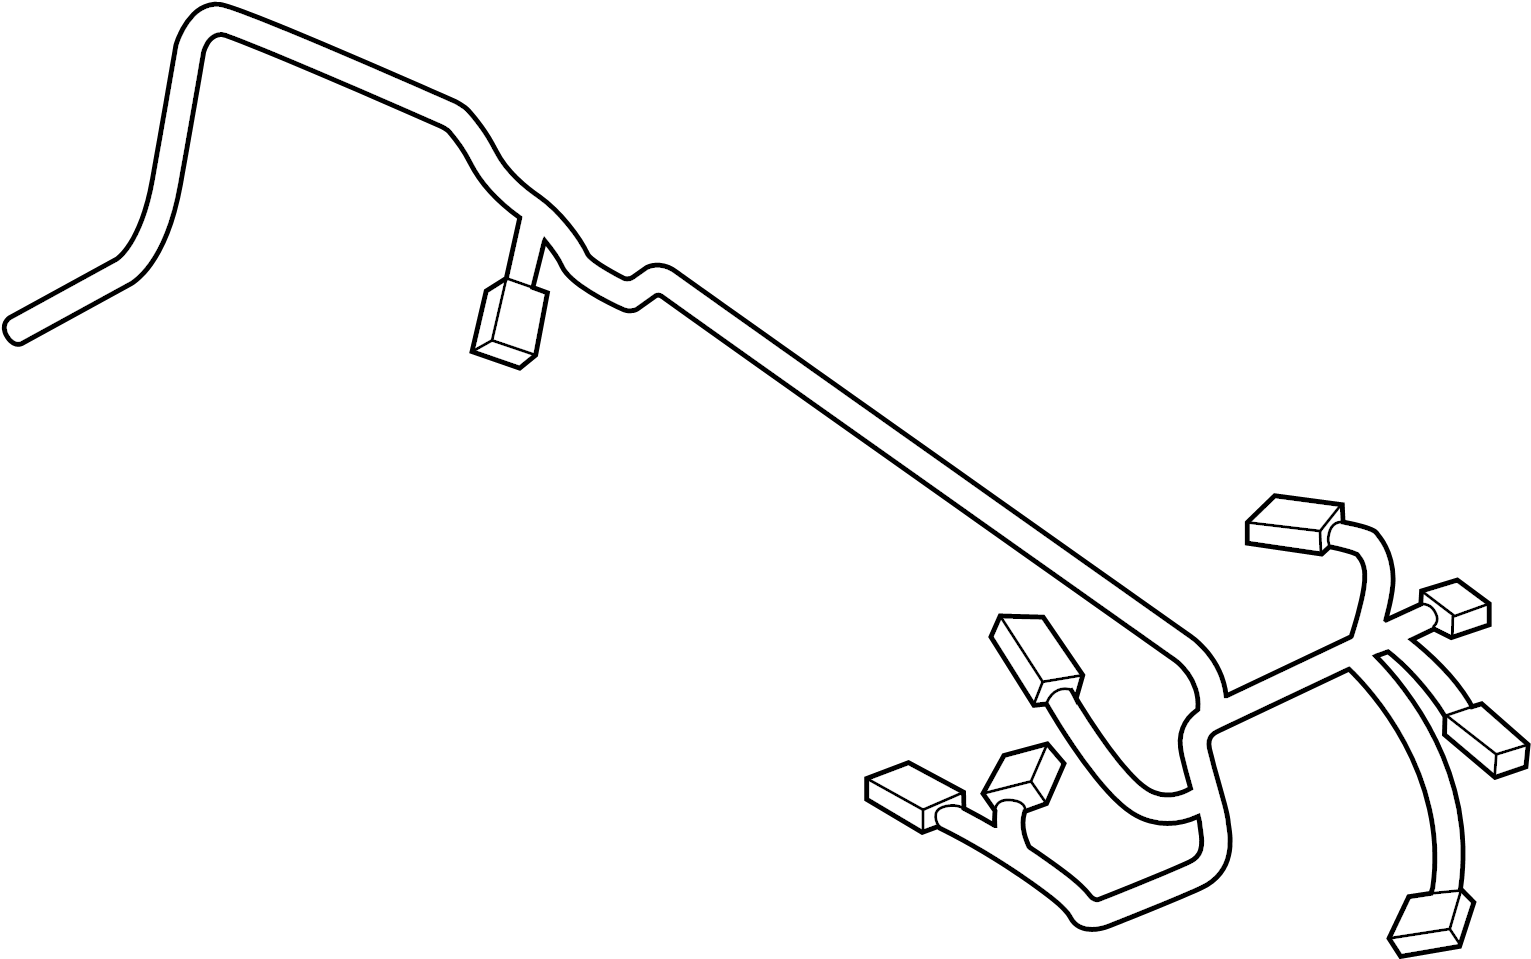 12518631662 - Wrng Harness  Motor  Sensorsystem  Module 1  Wiring  Engine  Electrical